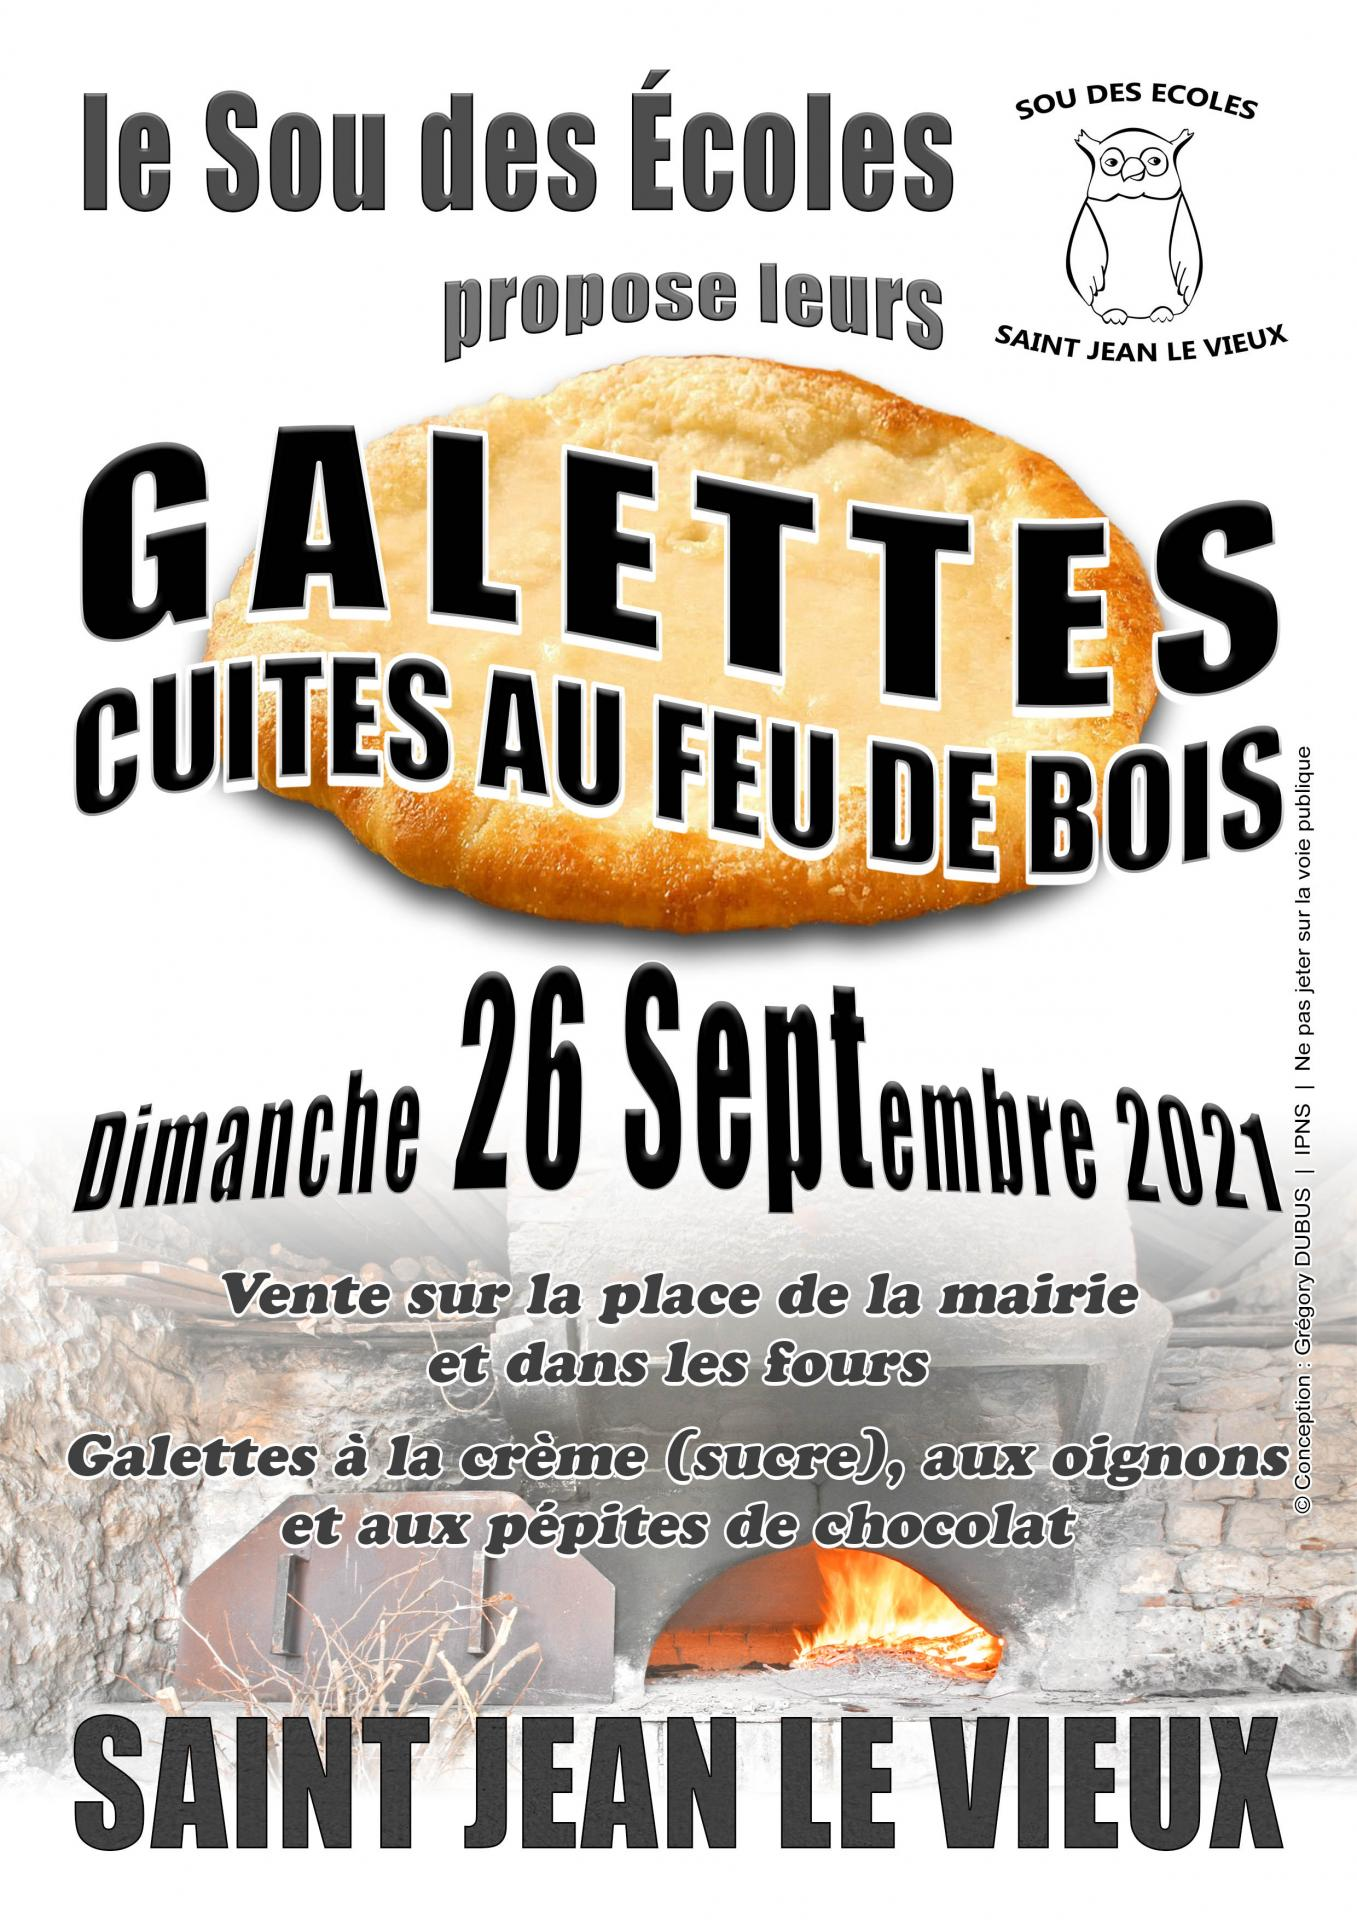 Affiche galettes ohsja sept 2021 v2021090307h43